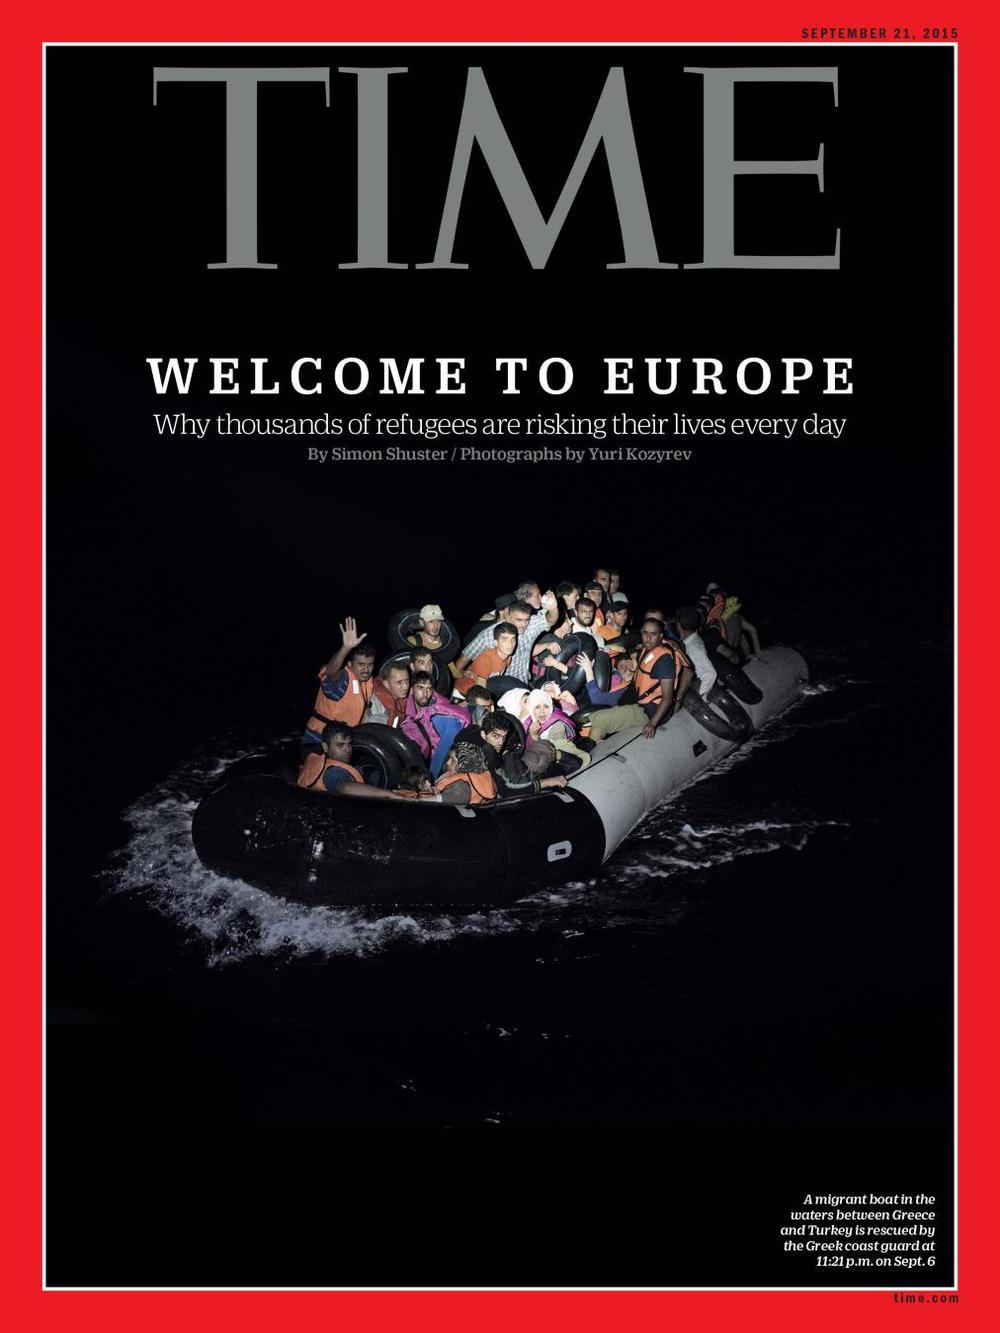 hk_1520_migrants1.jpg